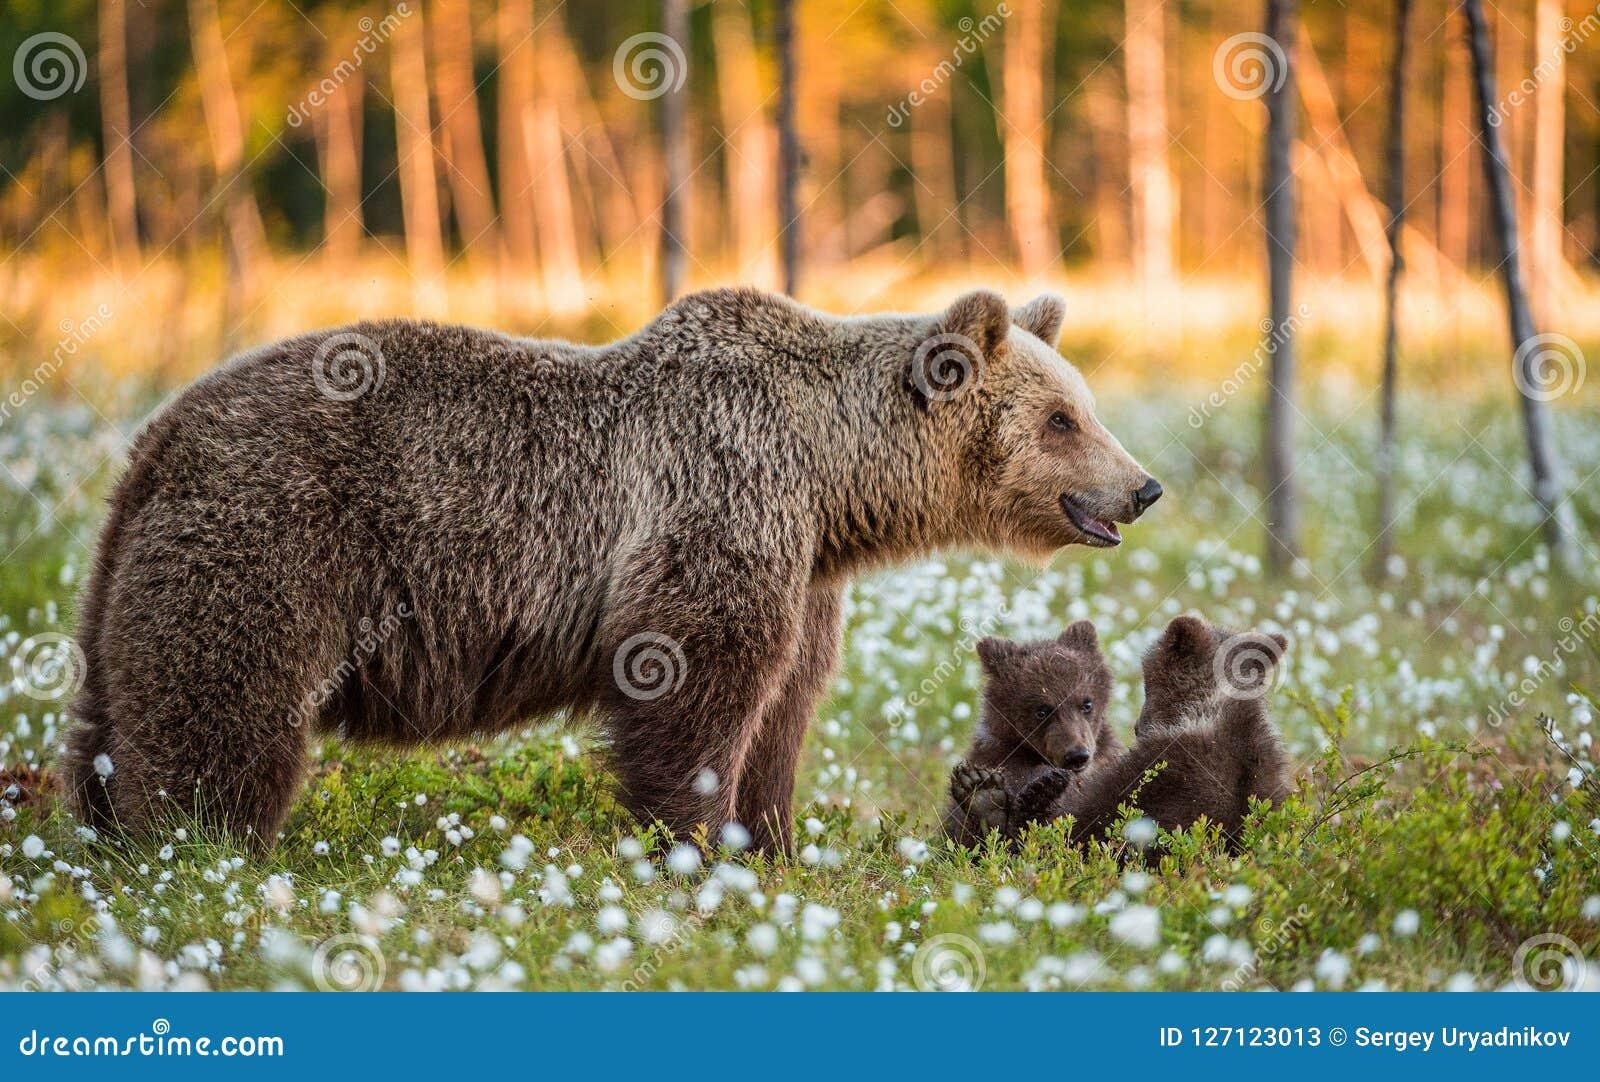 Cubs αυτή-αρκούδων και playfull αρκούδων Άσπρα λουλούδια στο έλος στο θερινό δάσος